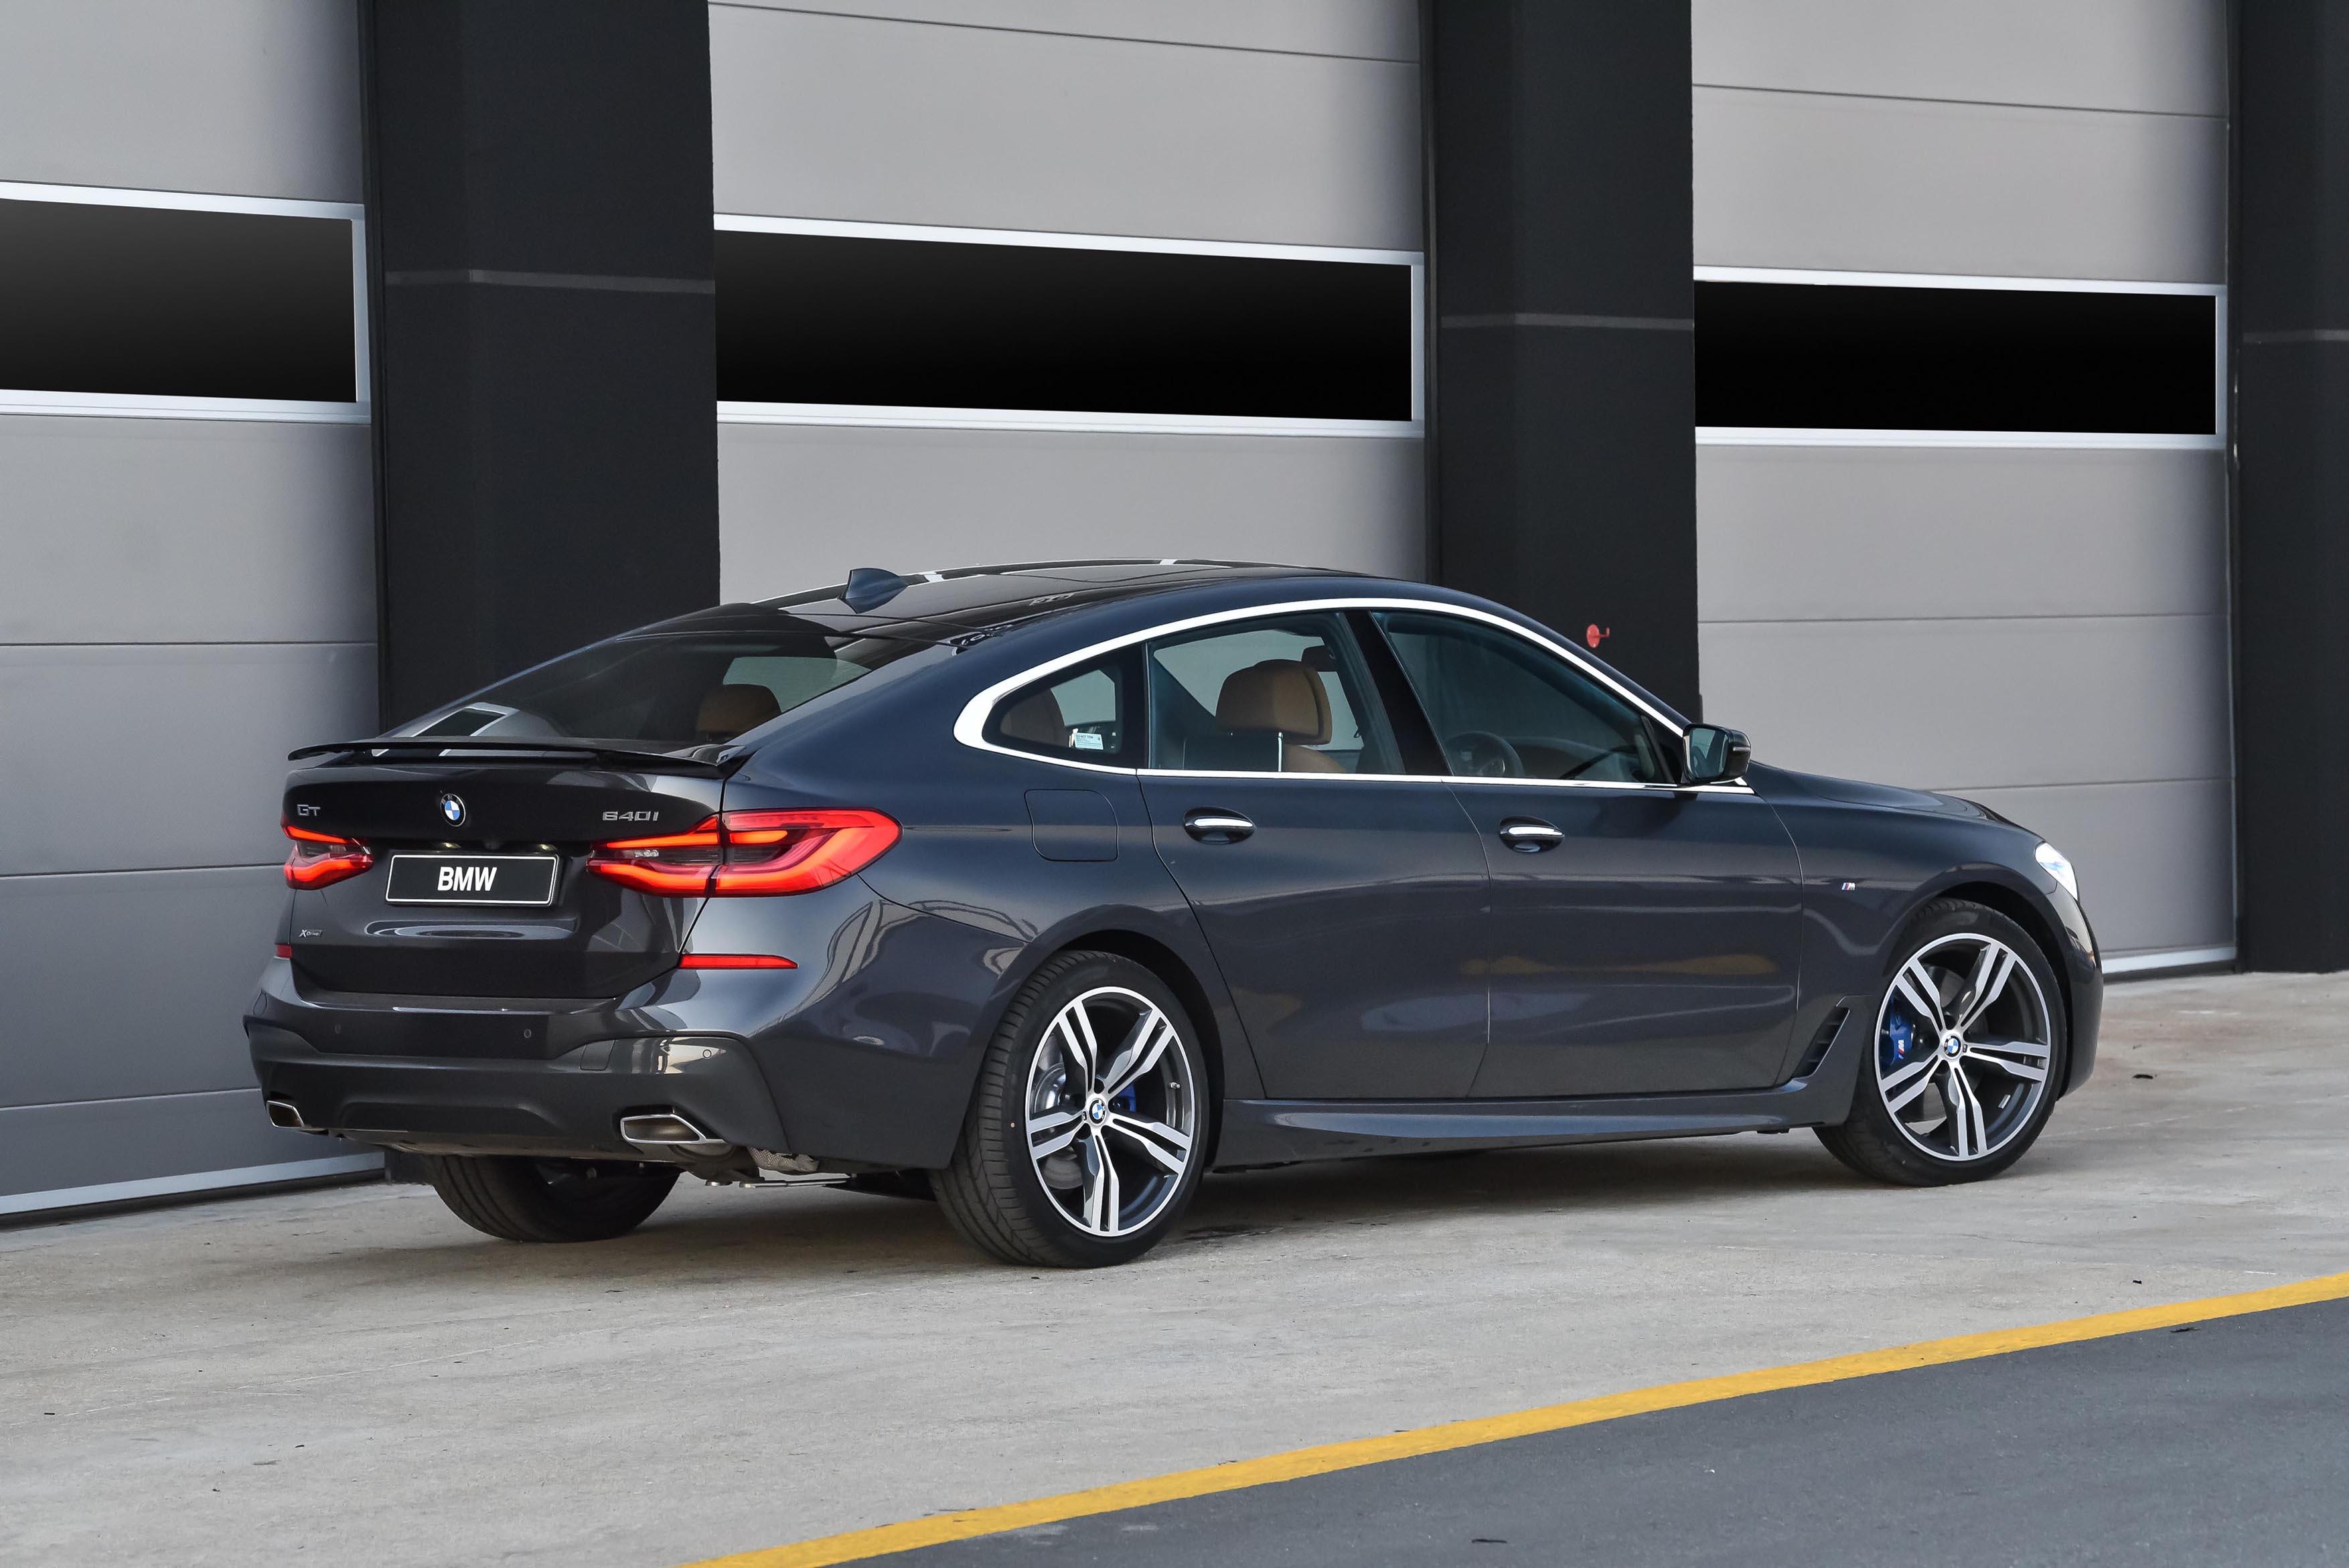 BMW 640i GT – A new twist on a familiar formula